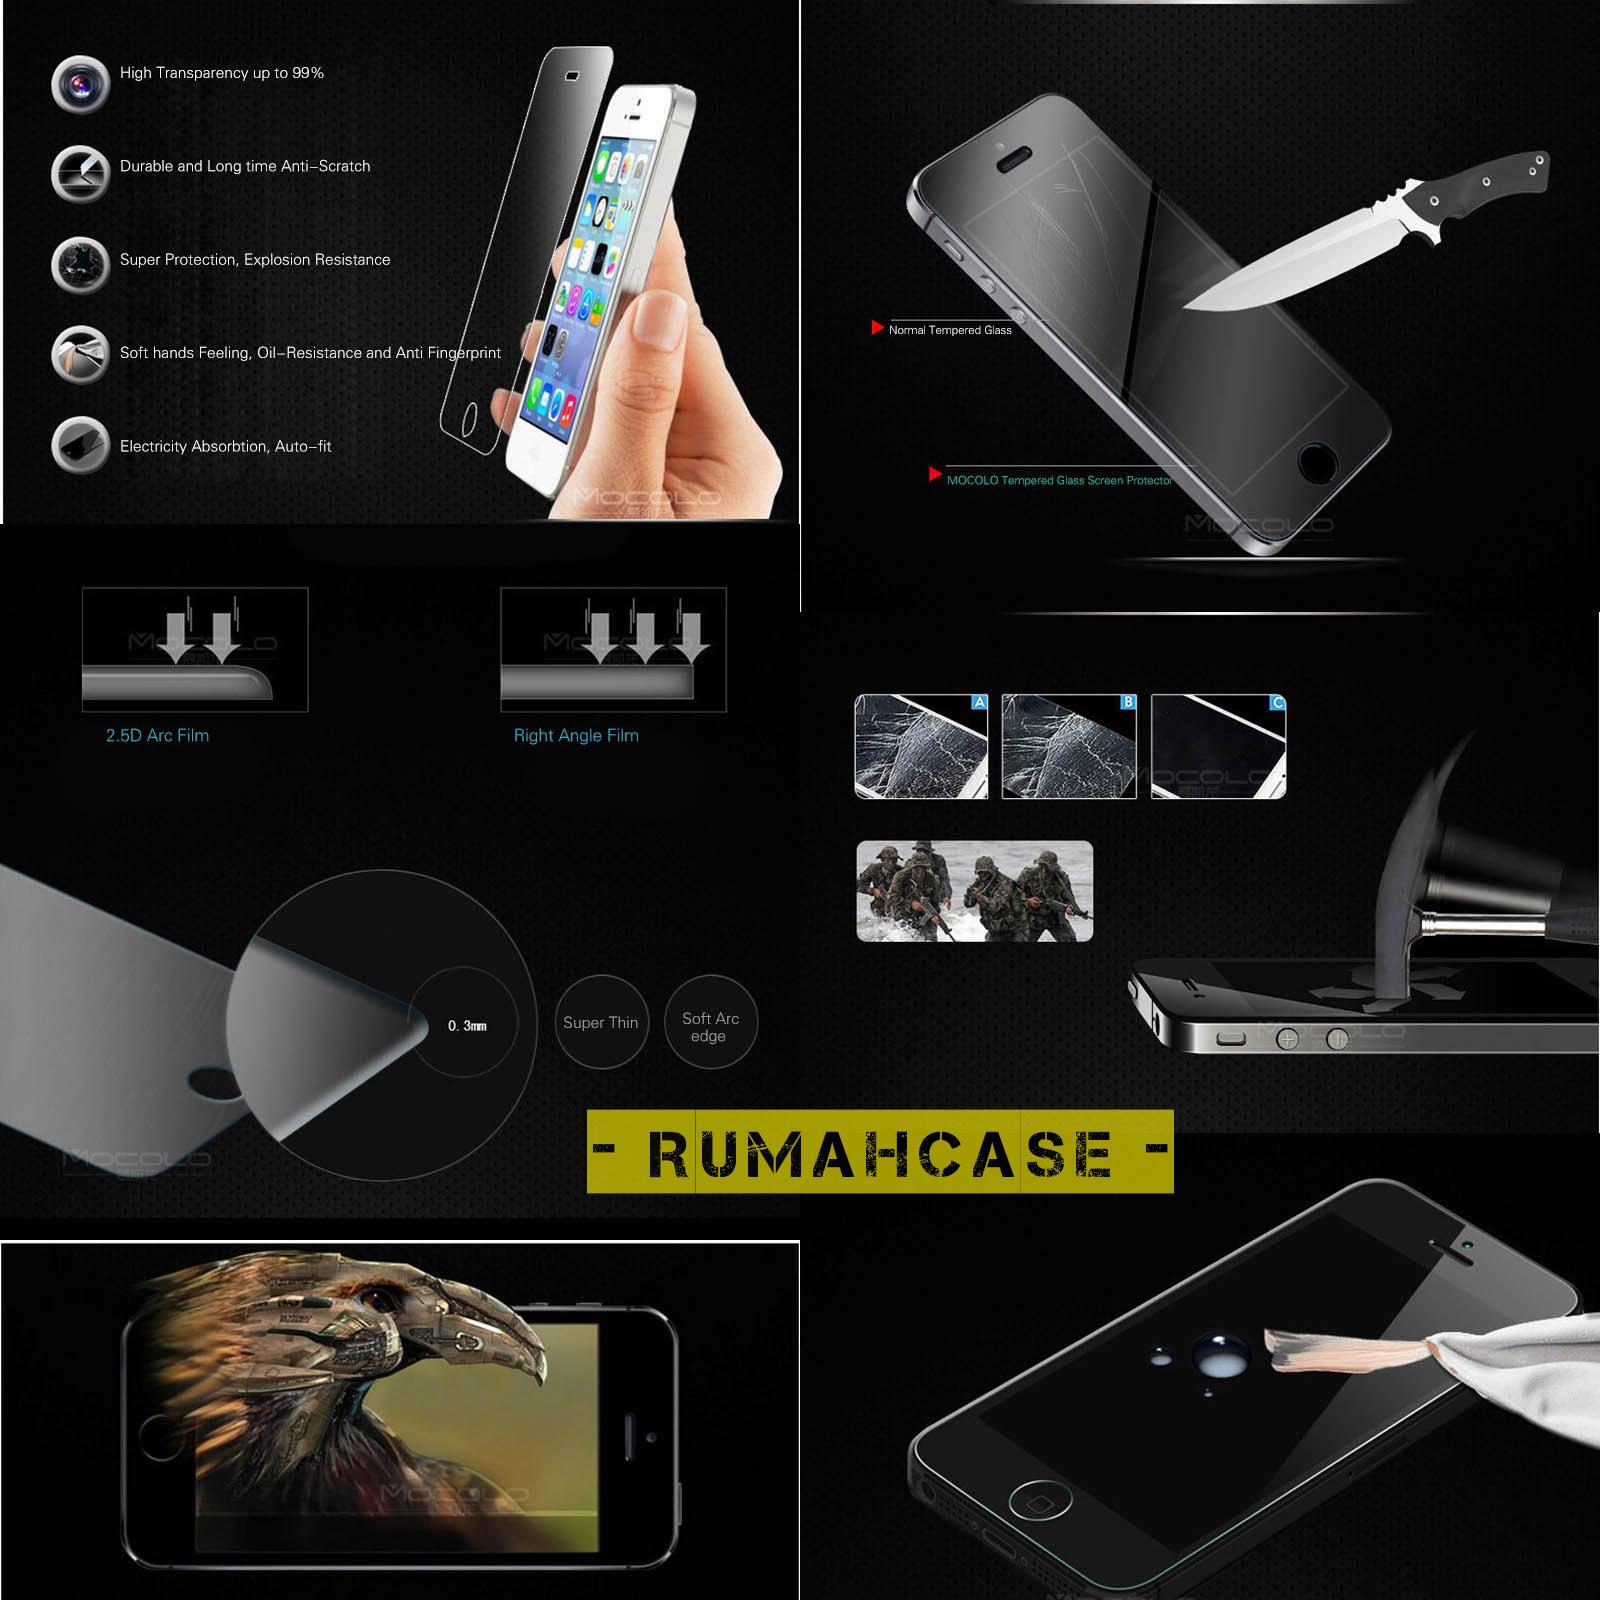 Jual Samsung Galaxy J7 Prime MOCOLO Premium Tempered Glass Anti Gores Kaca - sarungcasinghp | Tokopedia